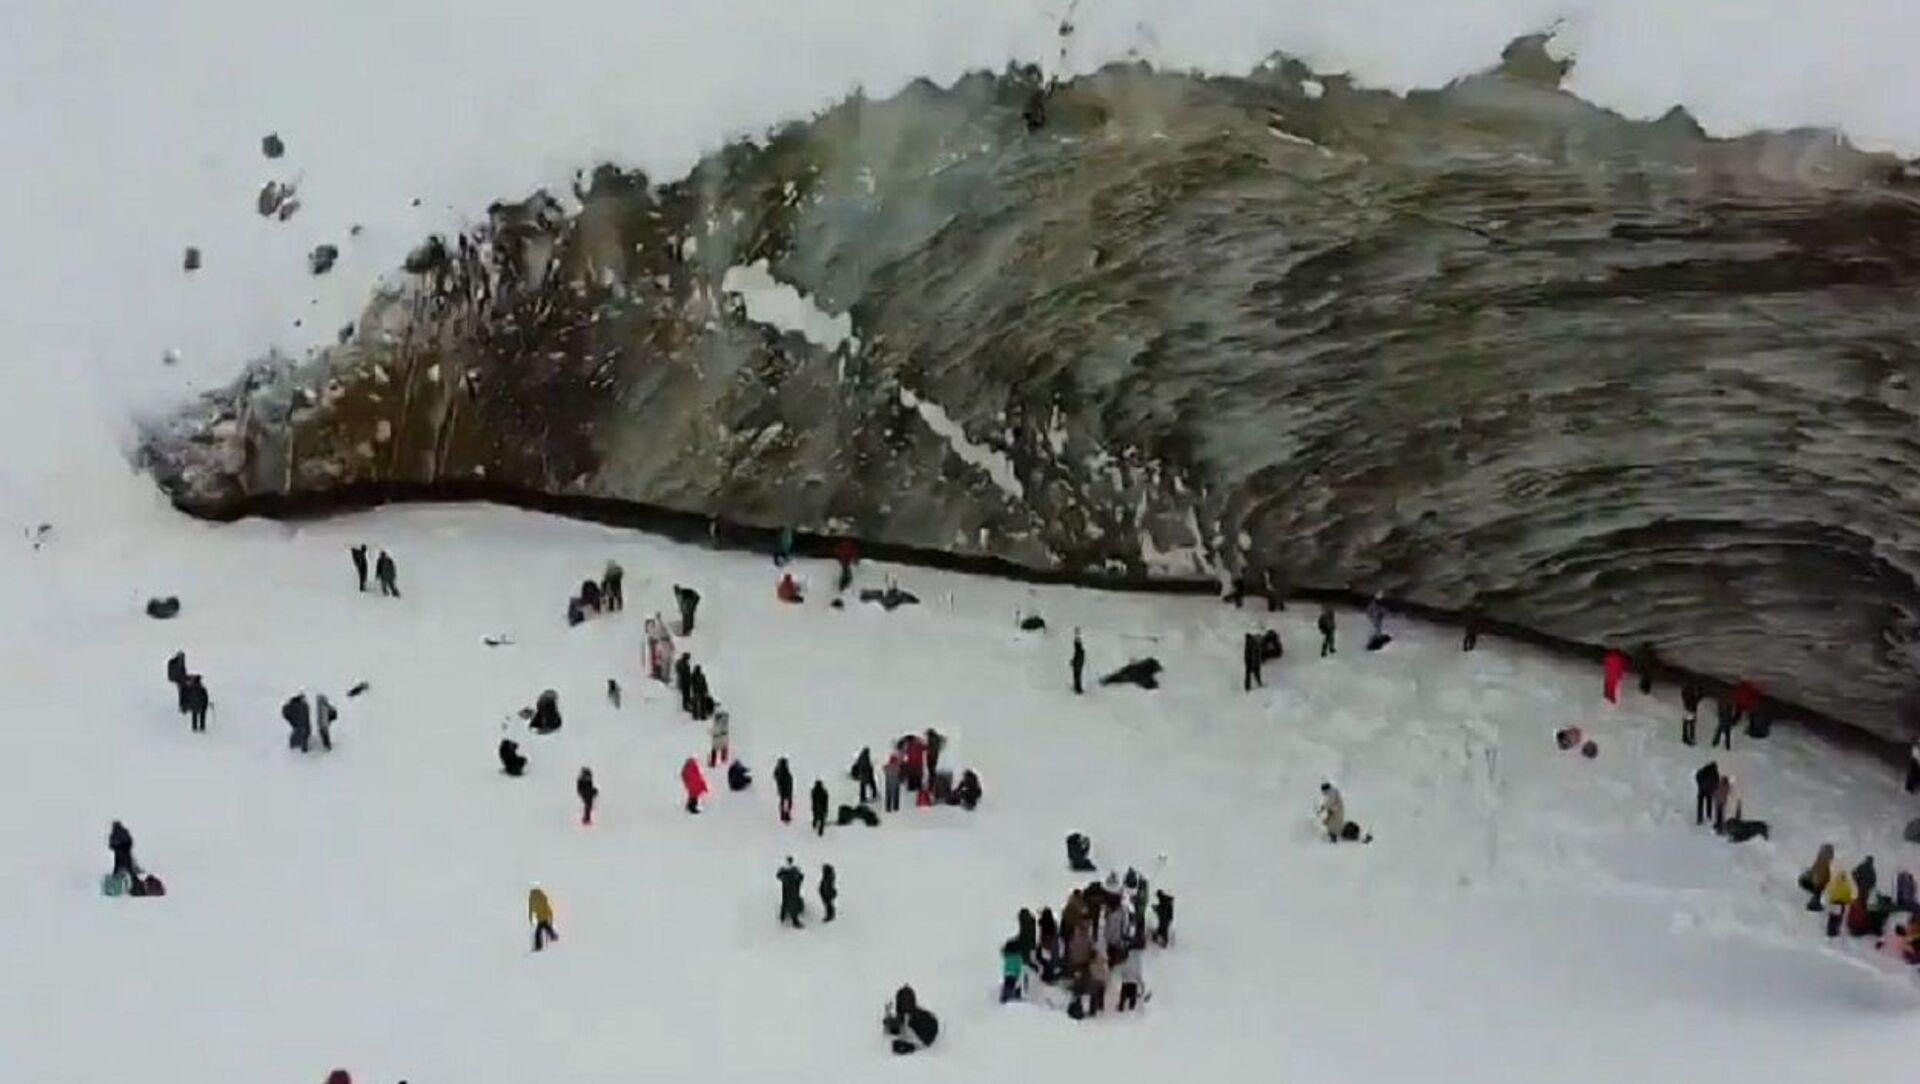 El glaciar Bogdanóvich en Kazajistán - Sputnik Mundo, 1920, 10.02.2021